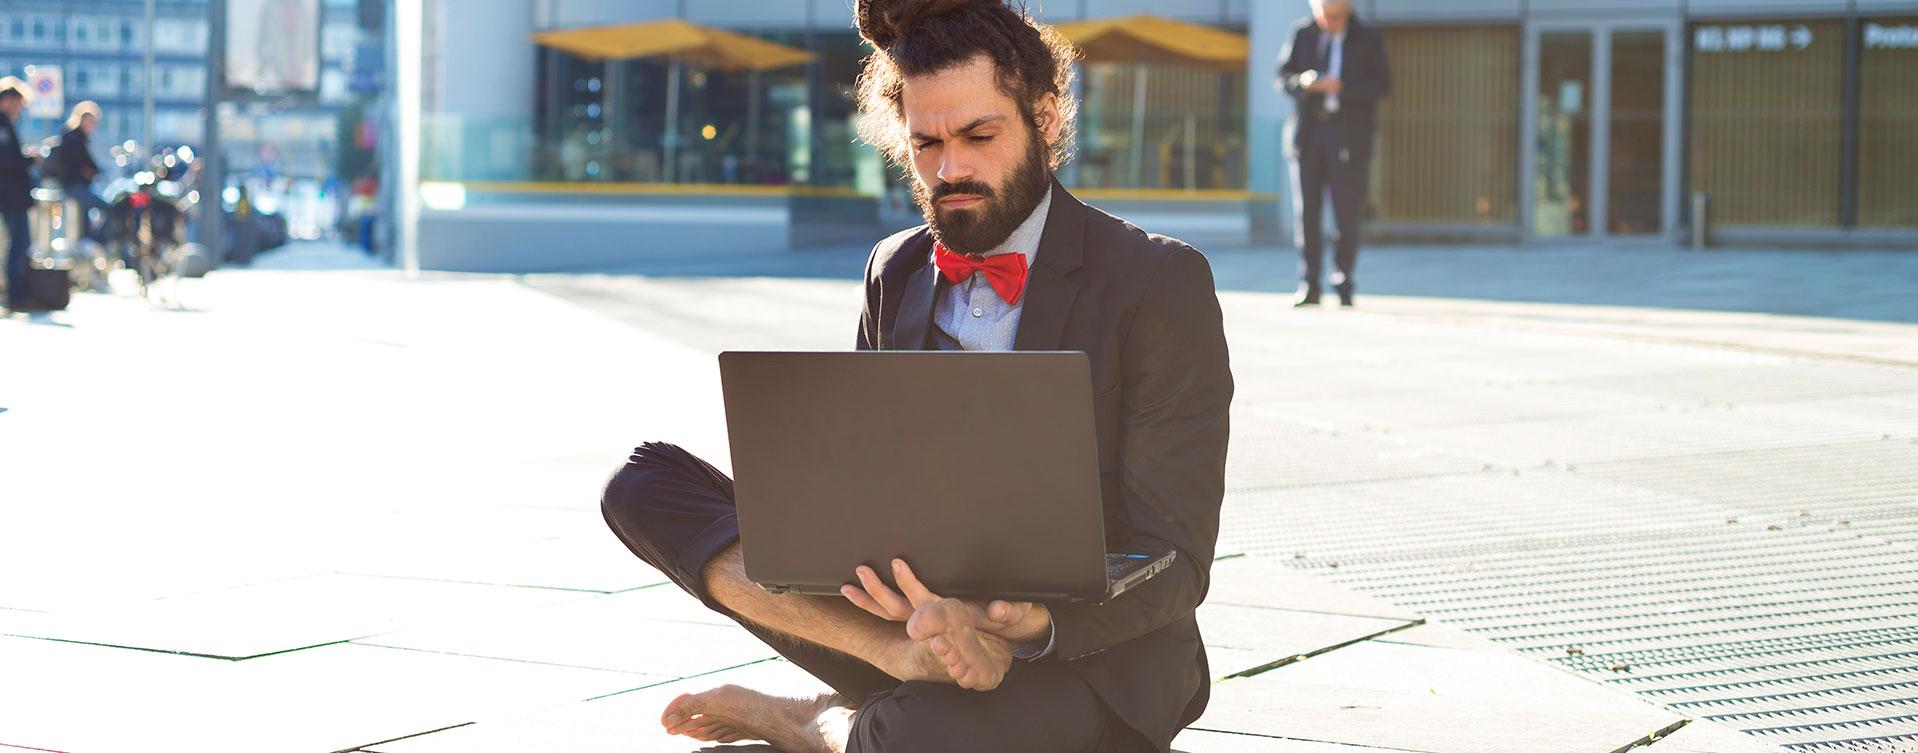 Marketing Gurus help you master intent marketing